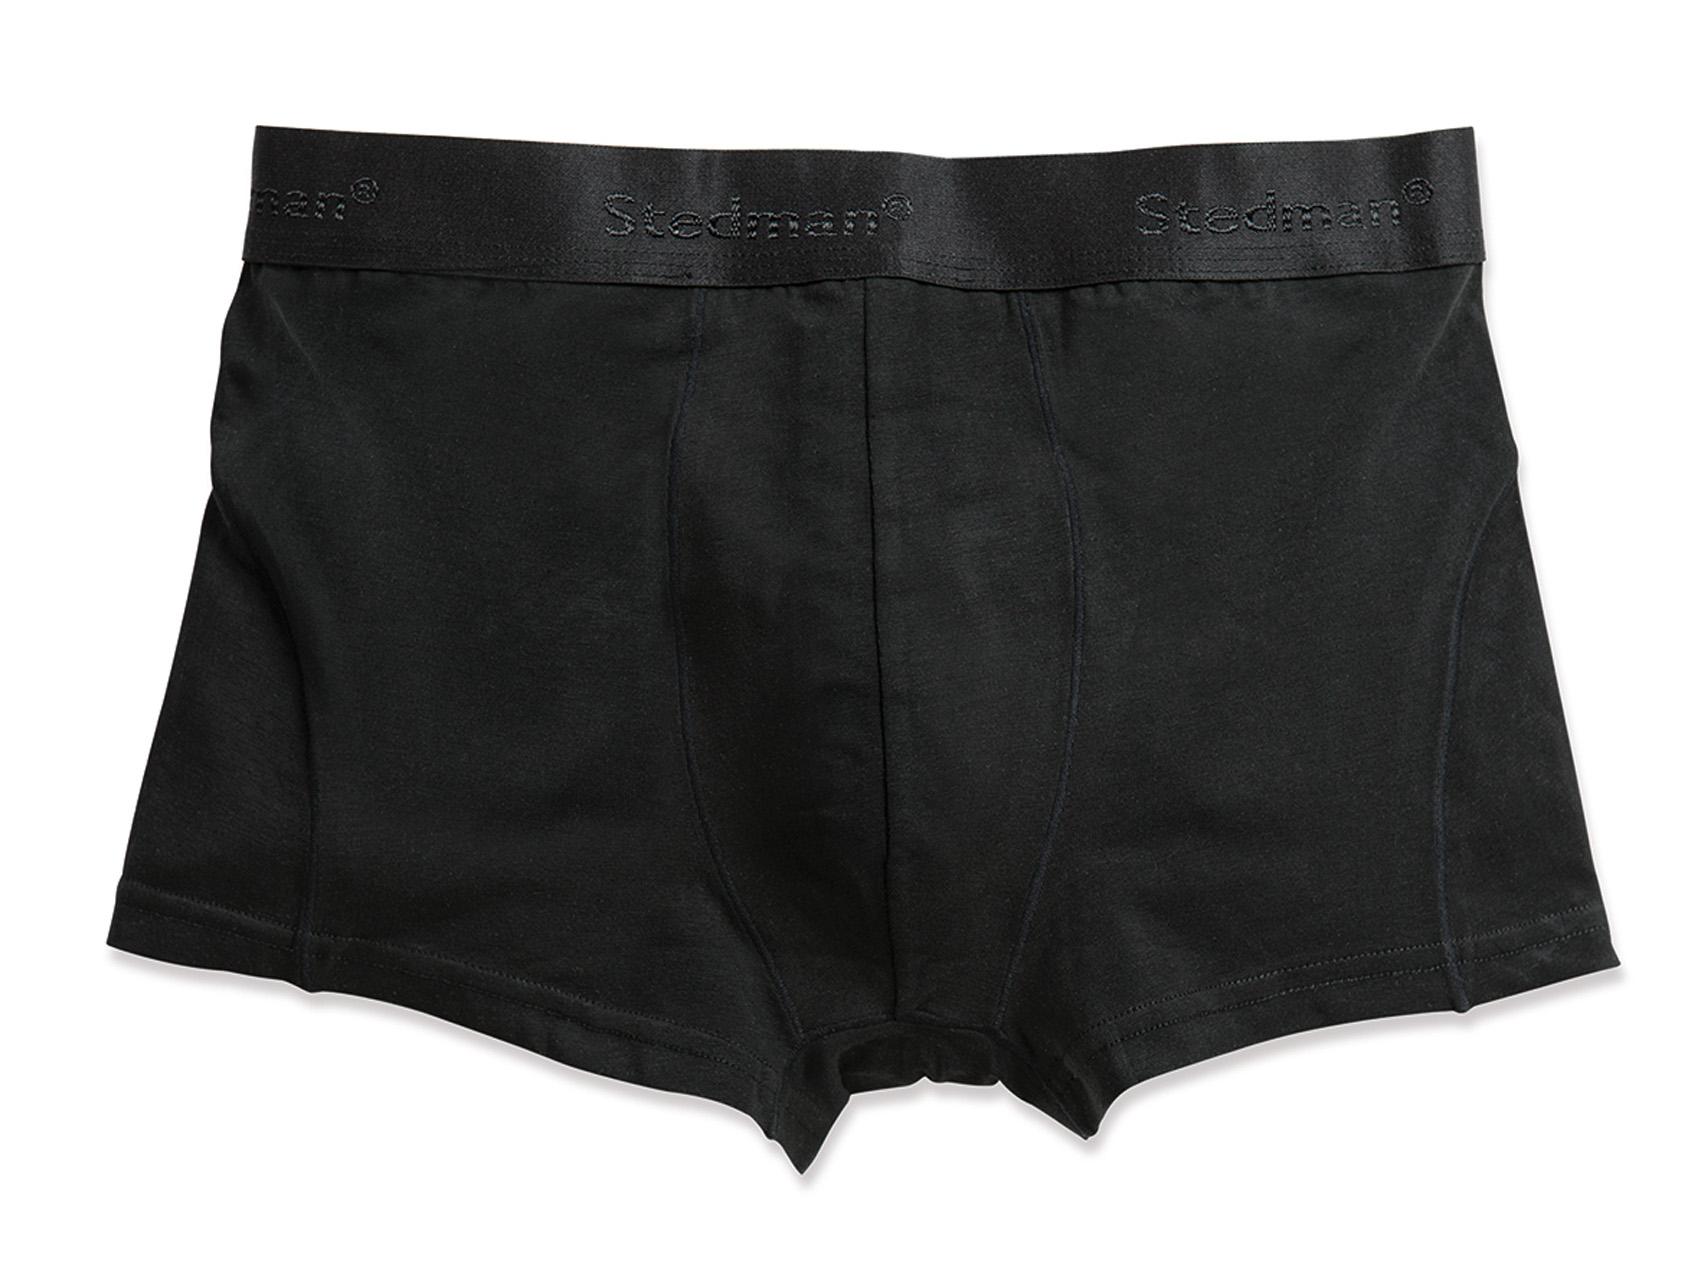 Stedman Underwear Boxers Dexter 2-pack